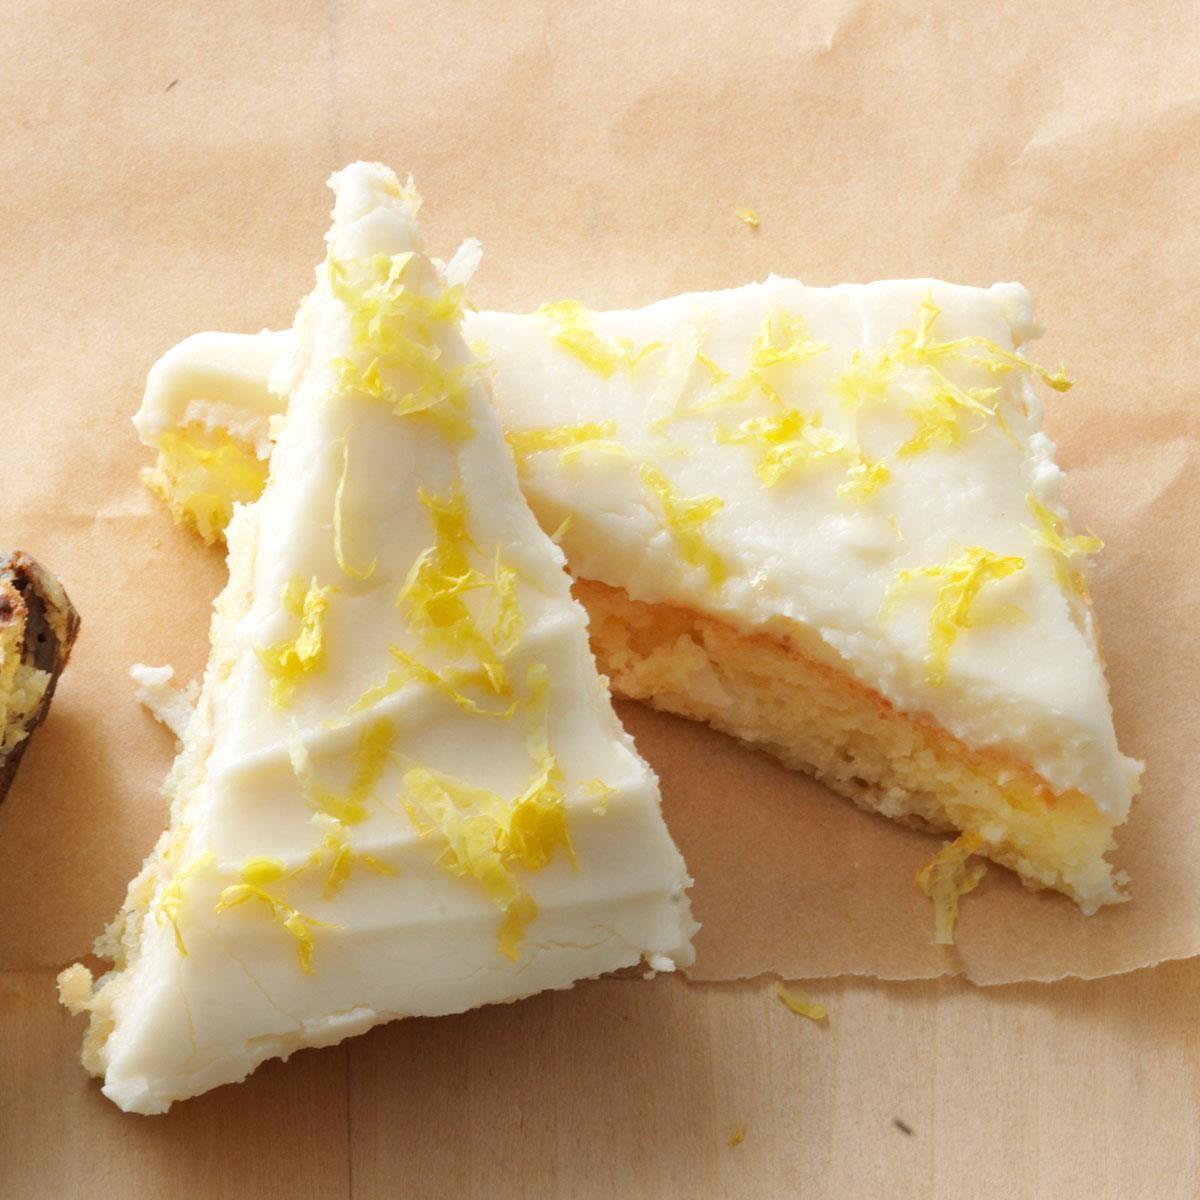 Taste Of Home Coconut Cake With Lemon Filling